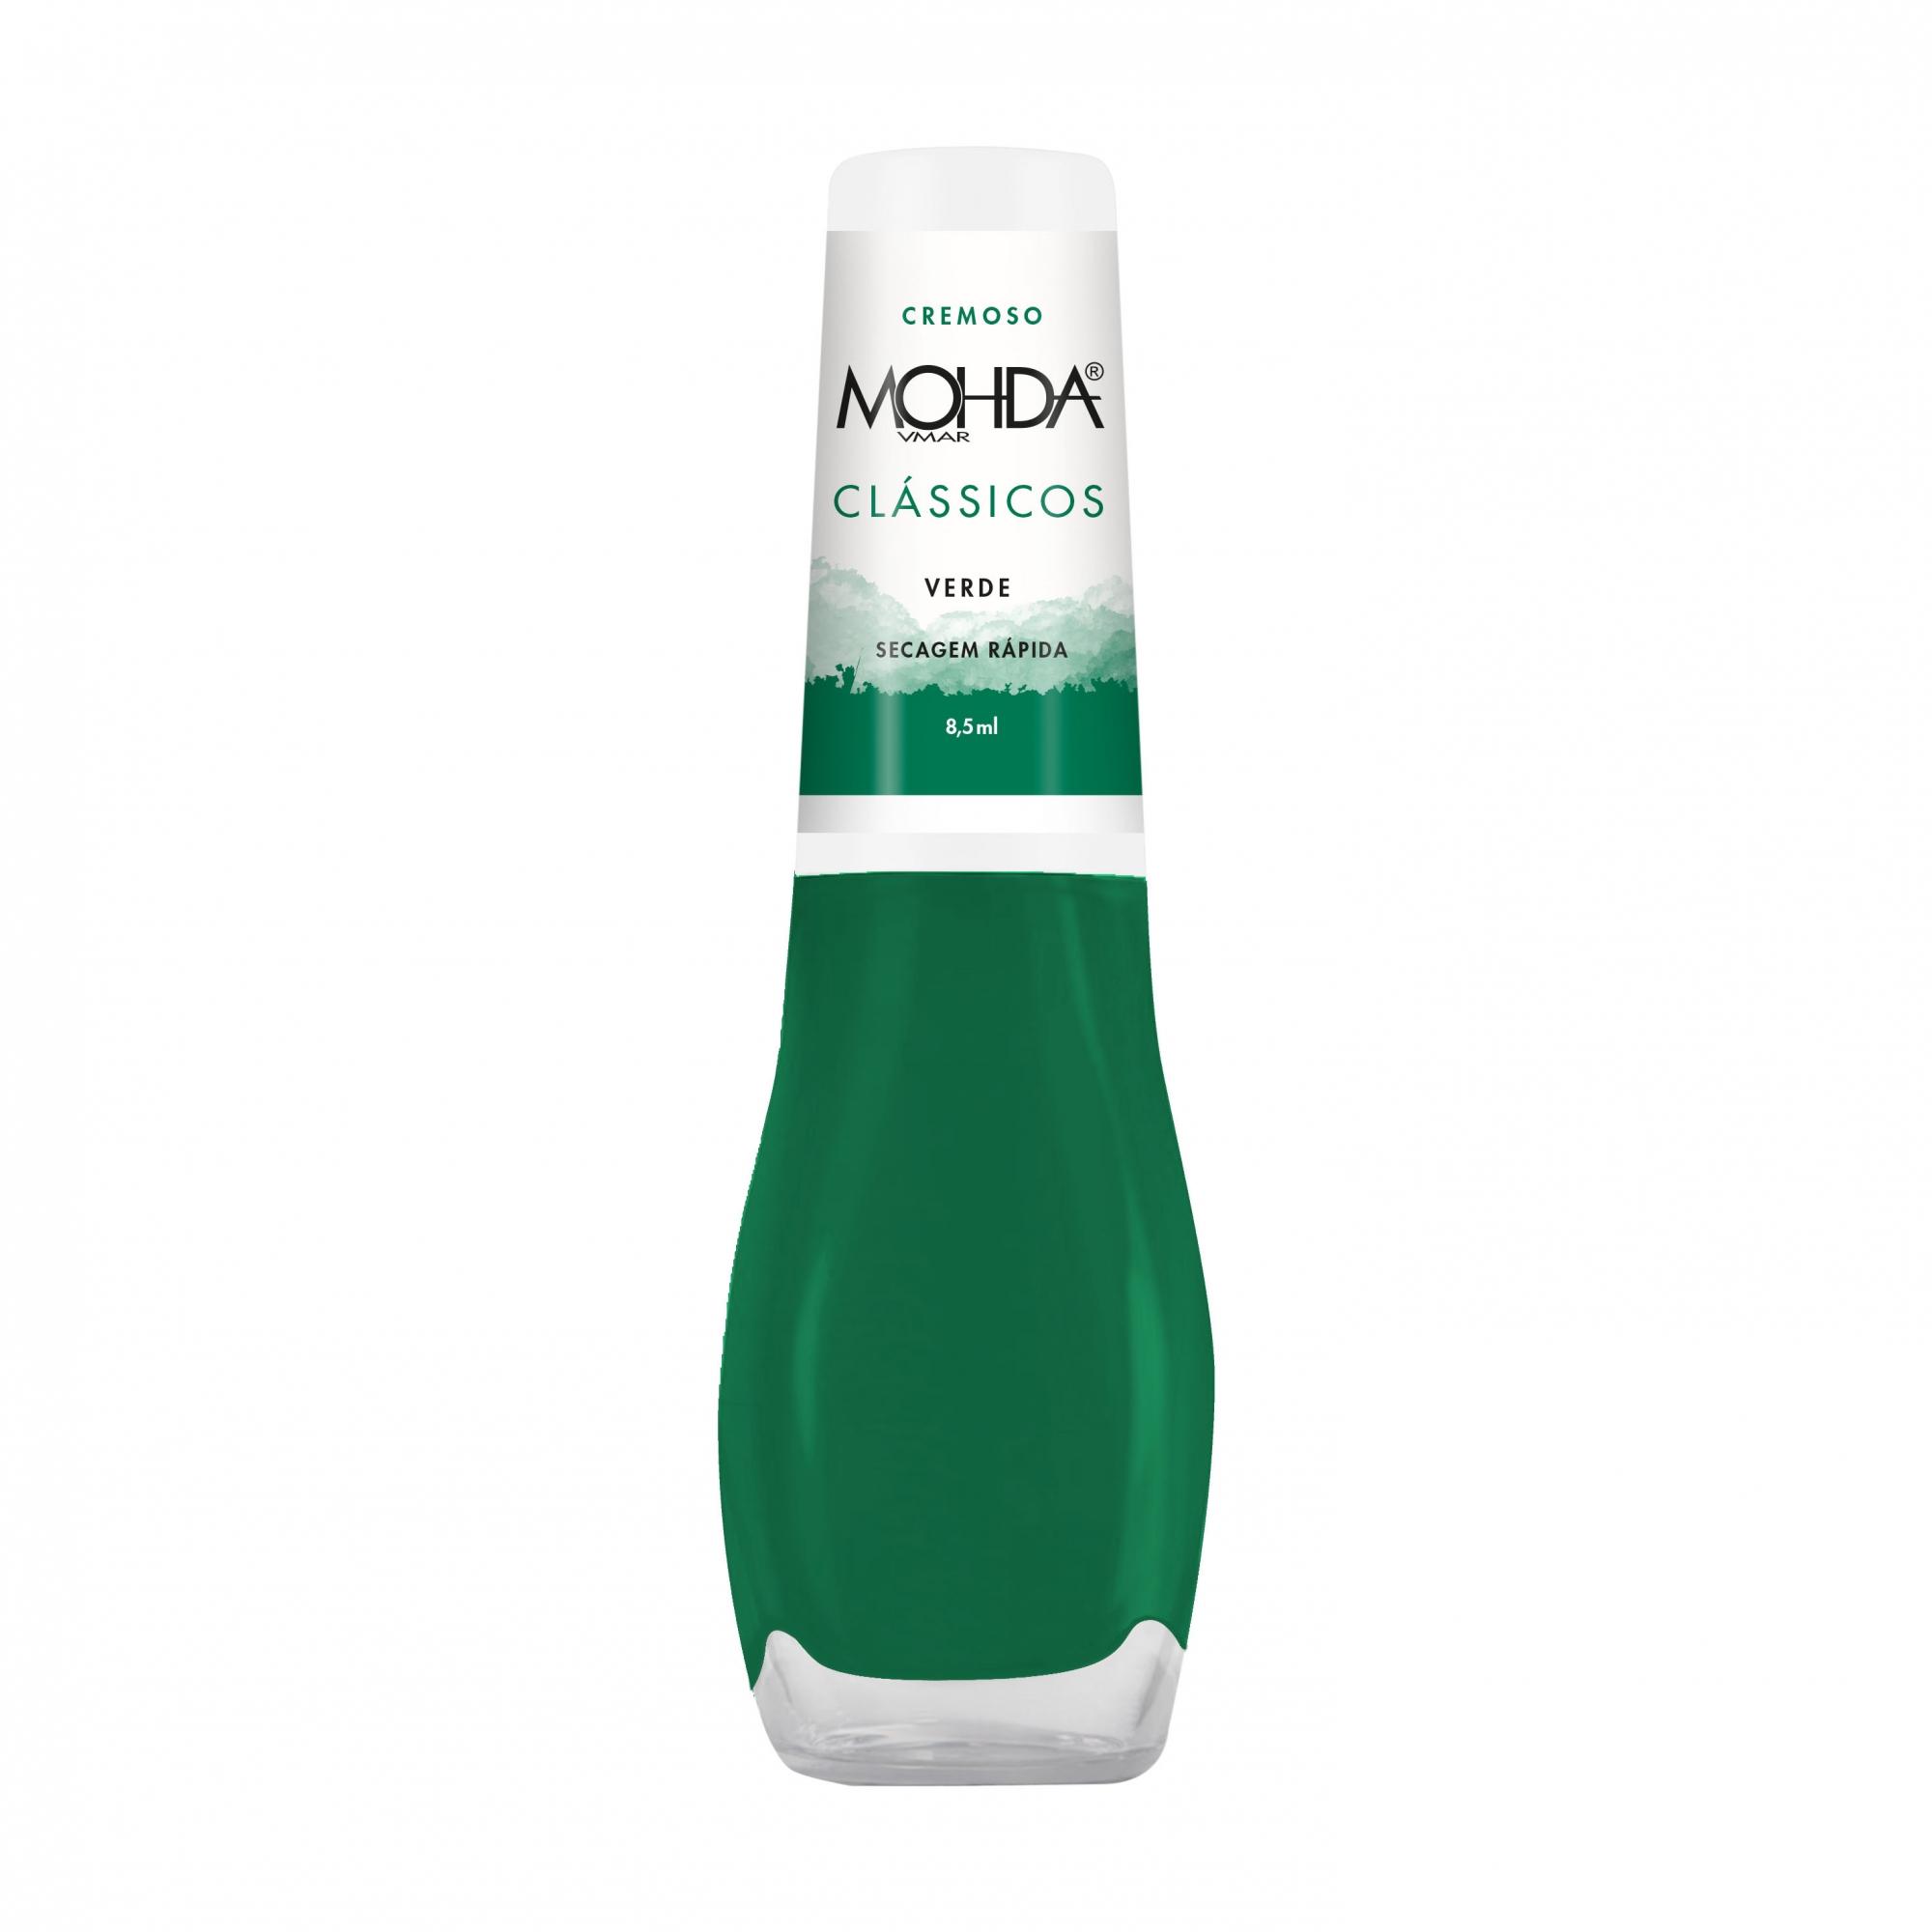 Esmalte Mohda Cremoso - Verde  - E-Mohda